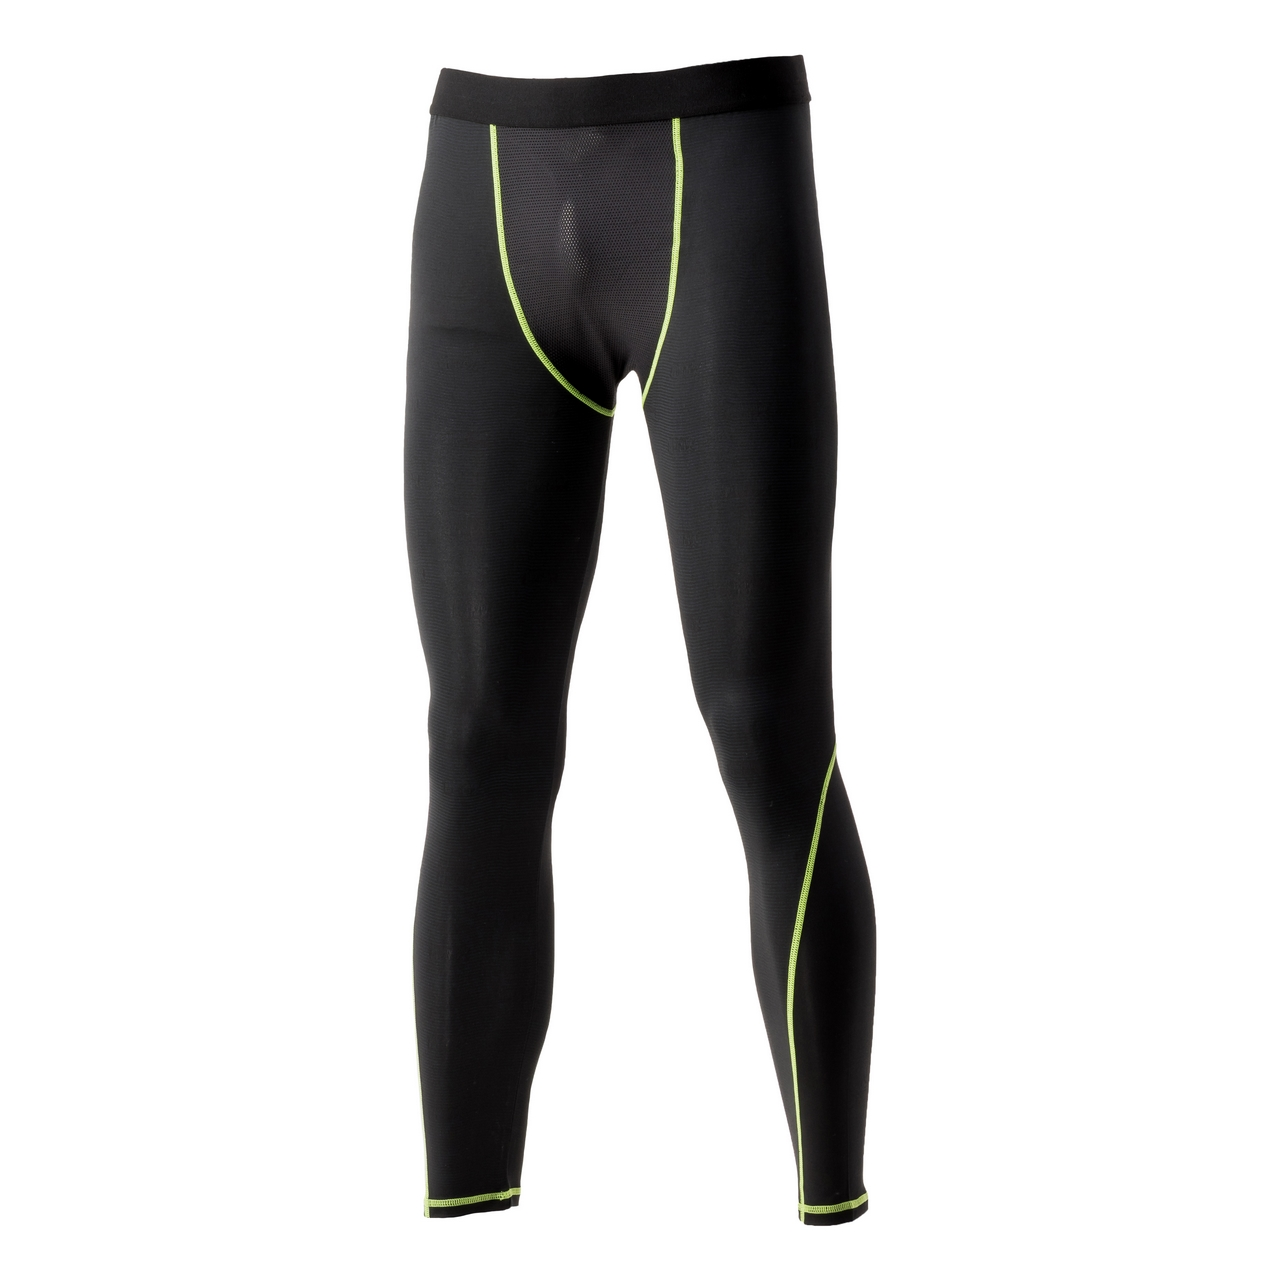 【山城】【BODY REGULATOR】Xylitol Print 冷卻內穿褲 - 「Webike-摩托百貨」